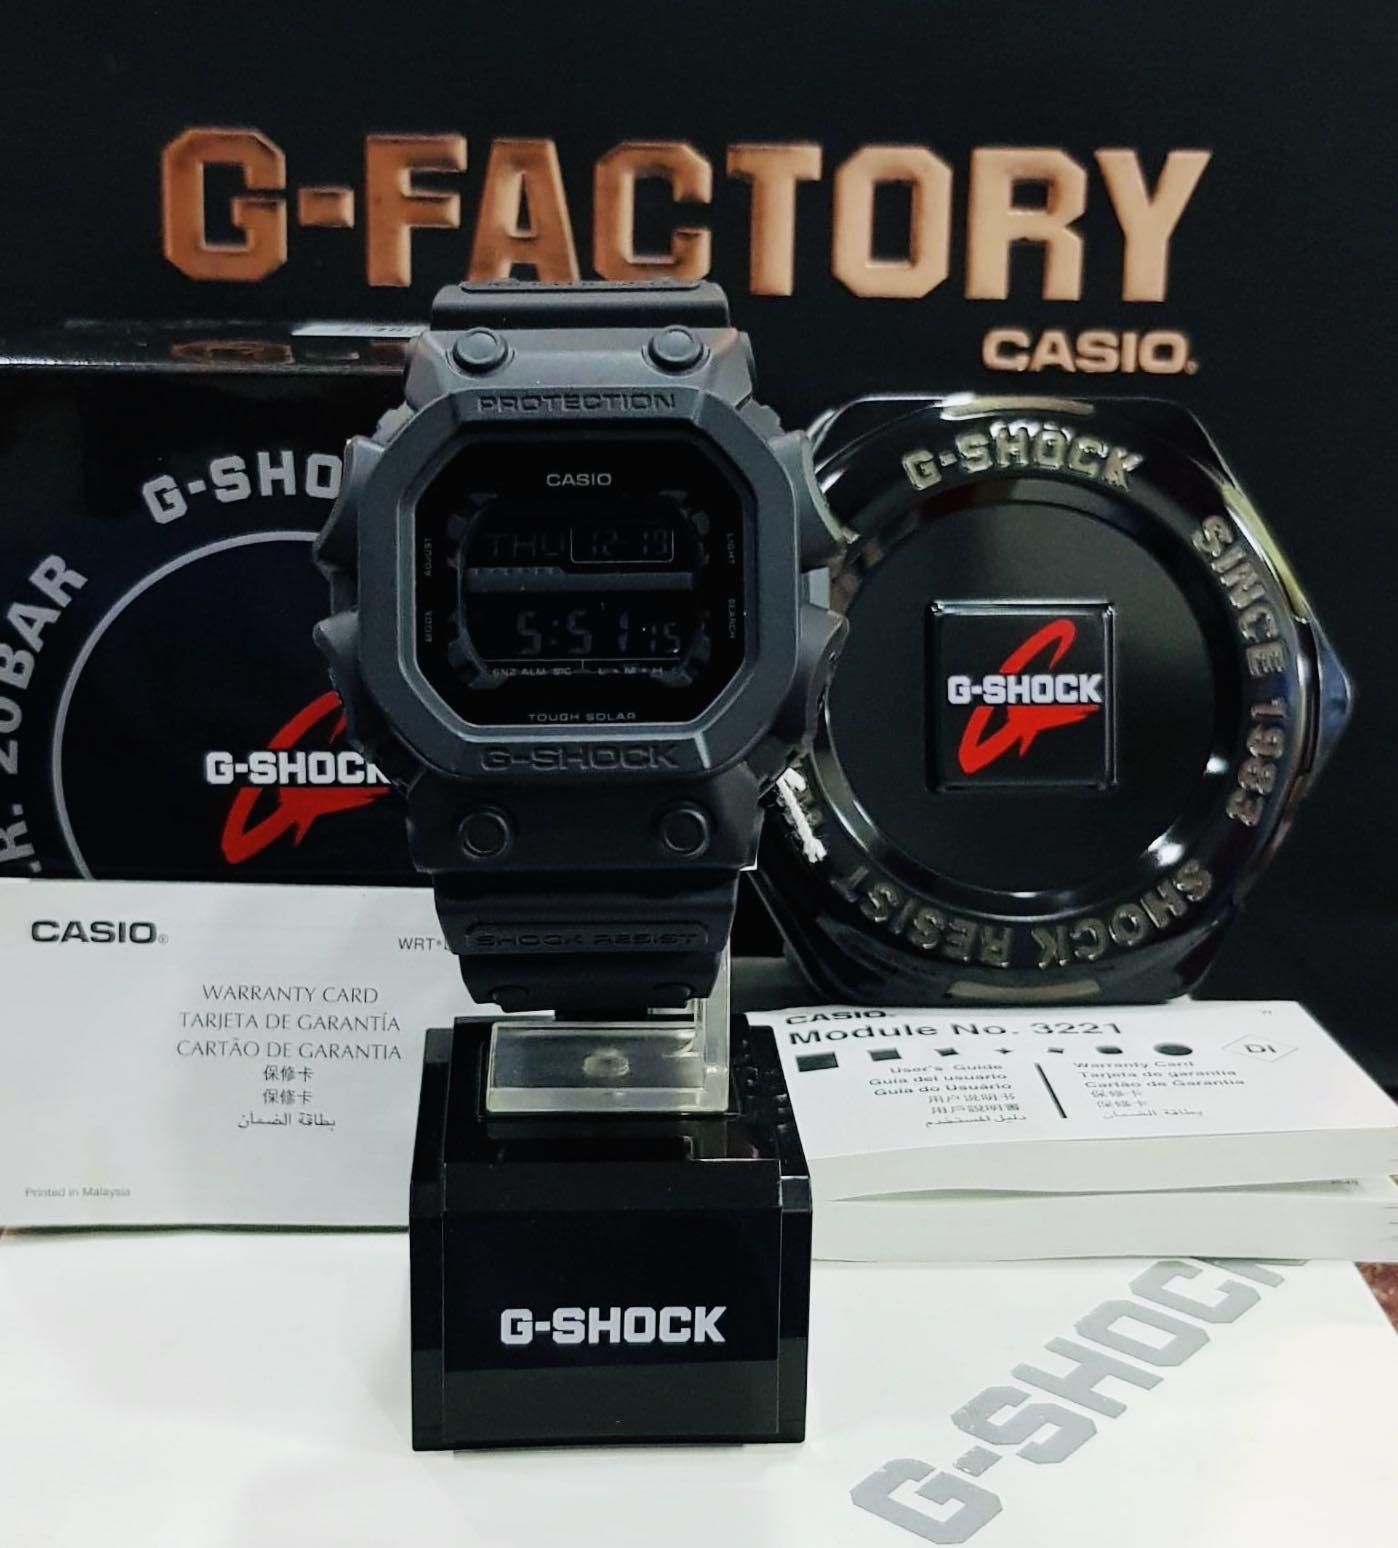 NEW🌟COUPLE💝SET : GSHOCK UNISEX DIVER SPORTS WATCH : 100% ORIGINAL AUTHENTIC CASIO BABY-G-SHOCK : GX-56BB-1DR + DW-5600BB-1DR (FULL-BLACK)